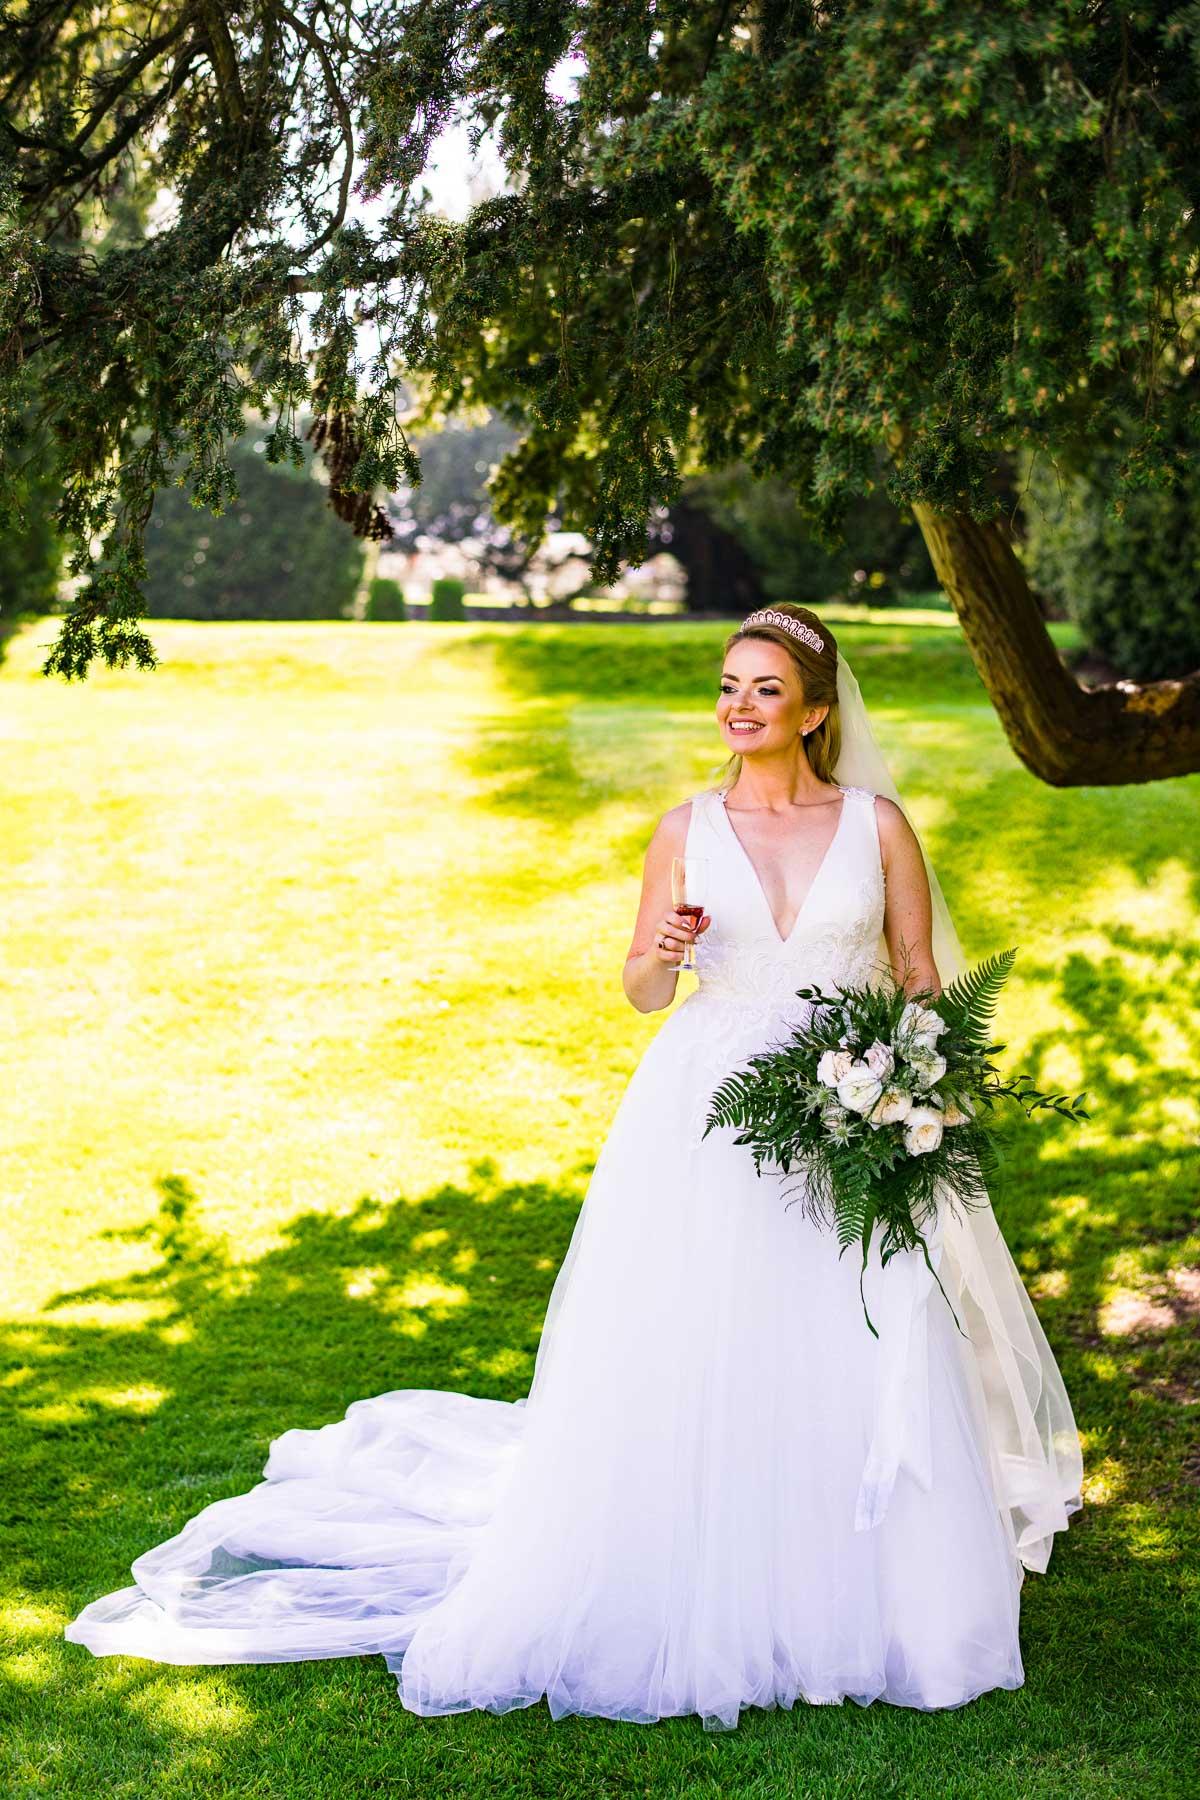 041Clearwell castle wedding photos Jonny Barratt Photography